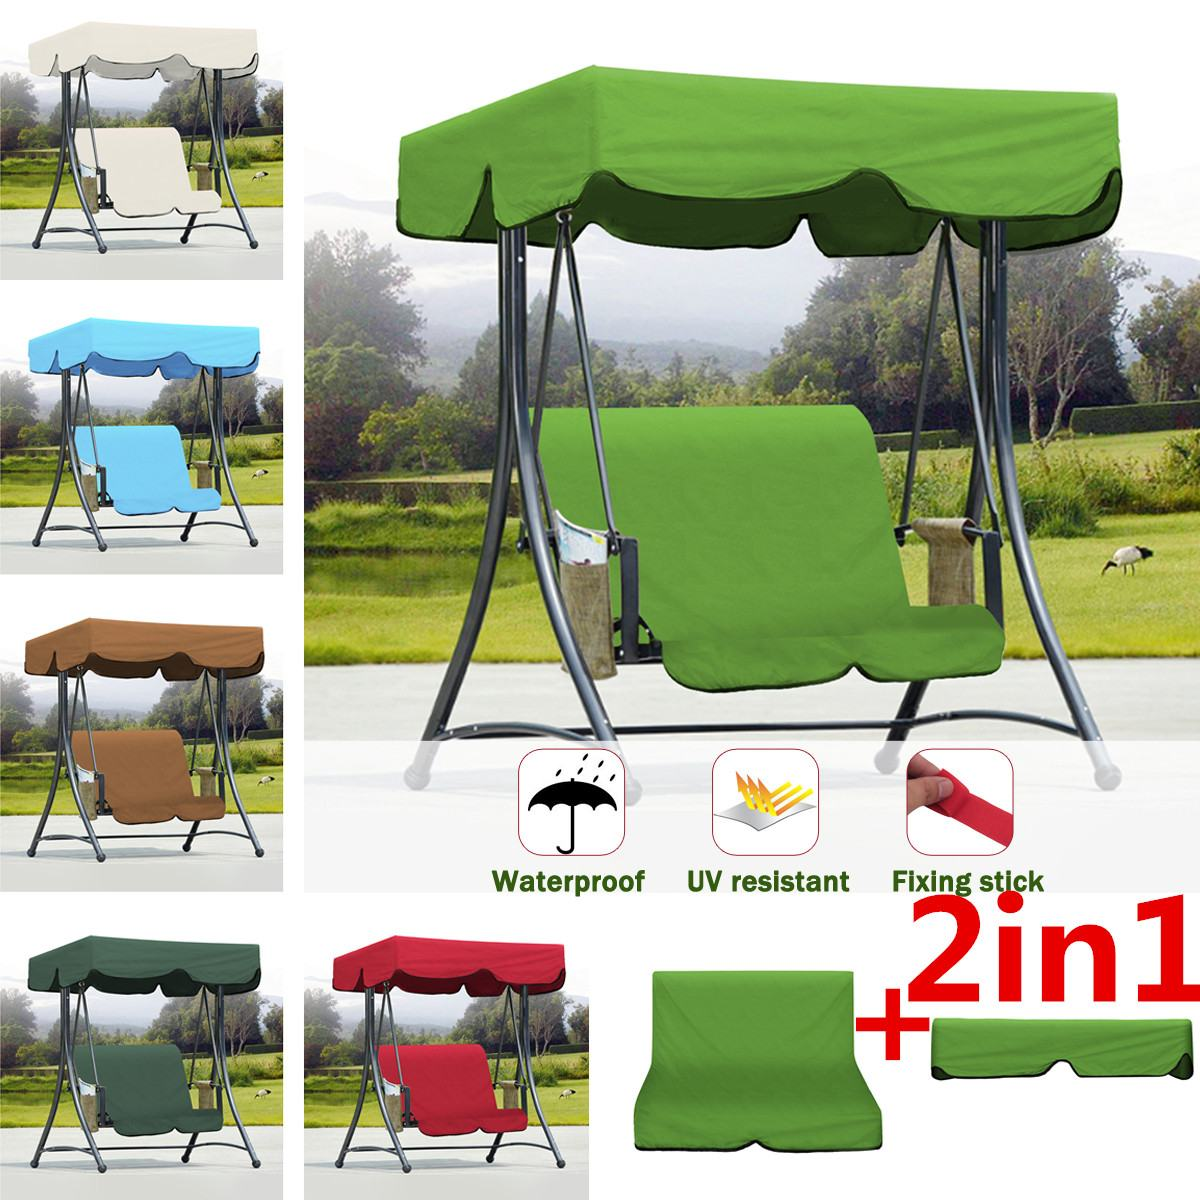 2Pcs Tahan Air Tahan UV Ayunan Hammock Kanopi + Bantal Kursi Musim Panas Kolam Halaman Taman Tenda Swing Top Cover